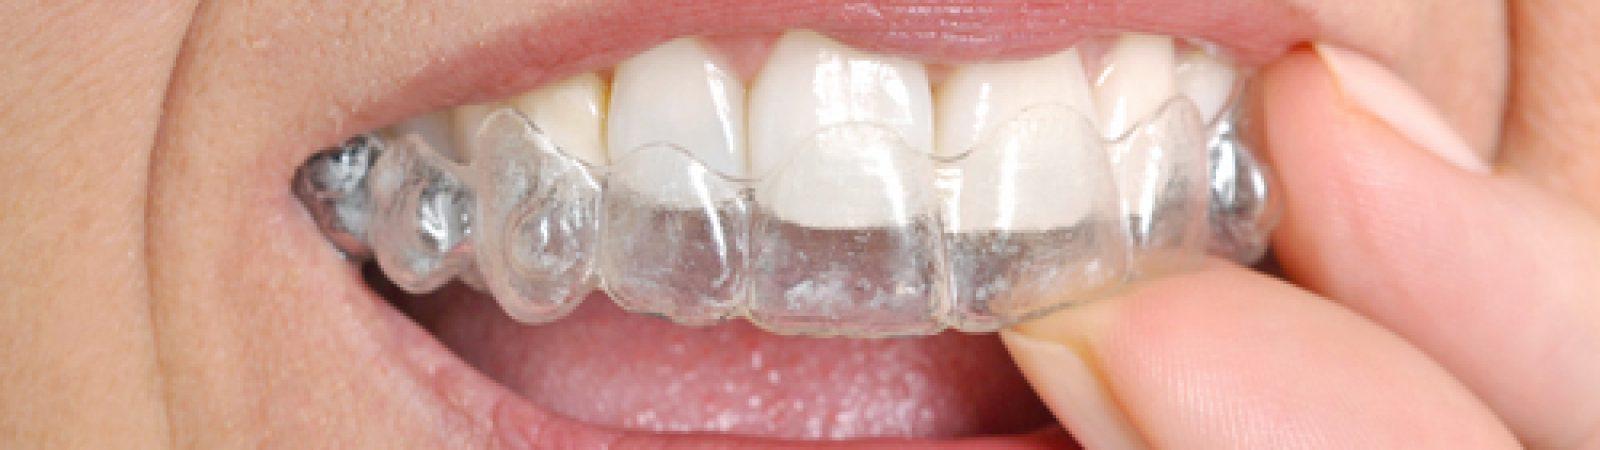 comprehensive orthodontic options